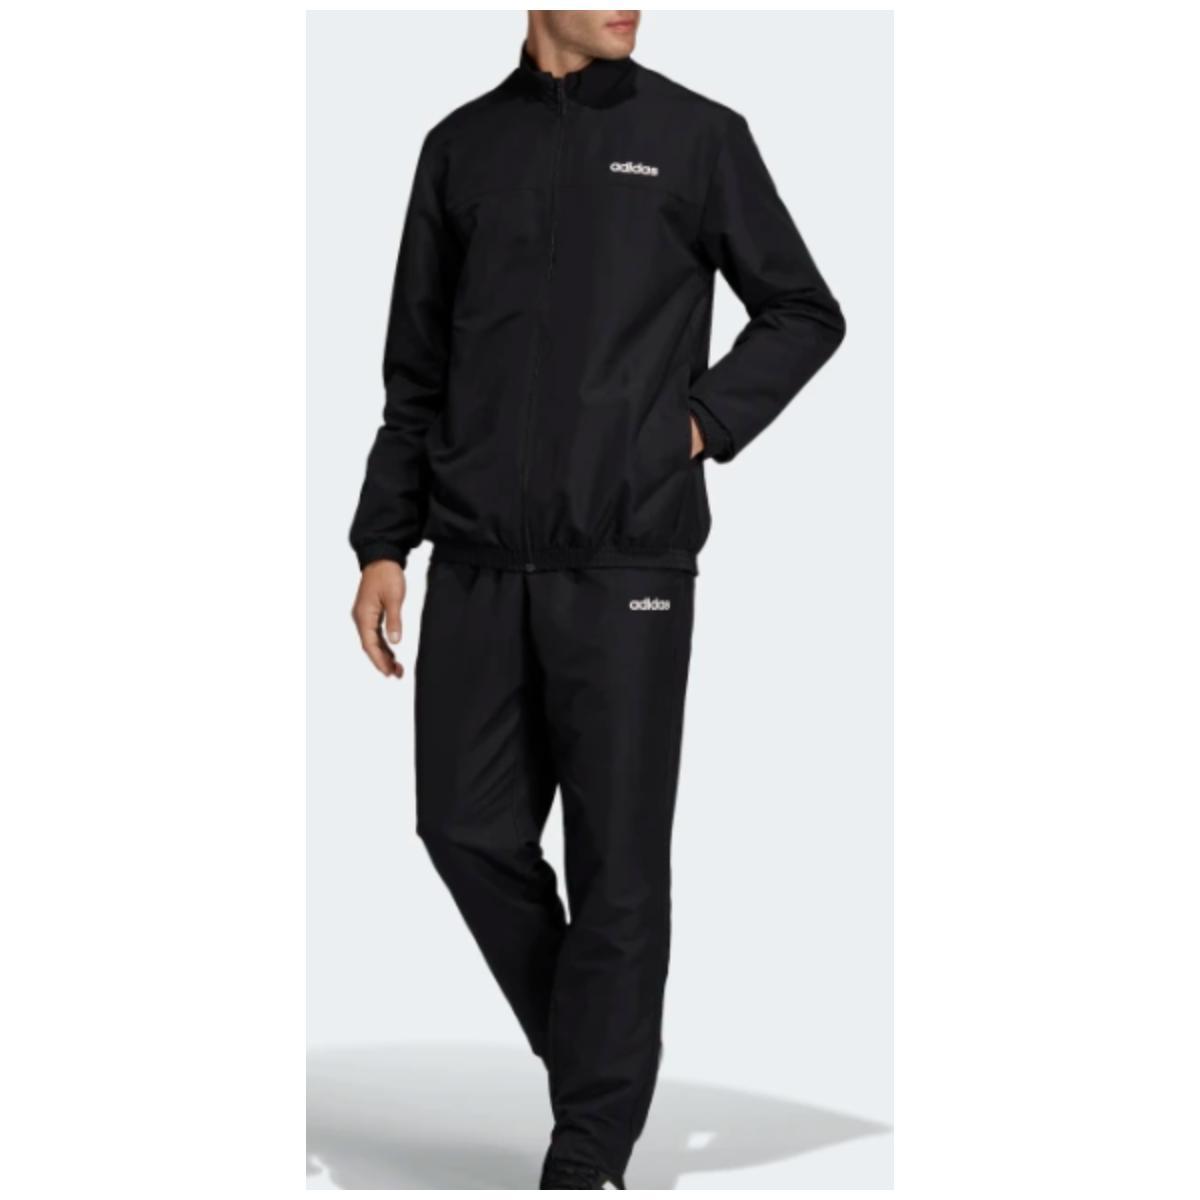 Abrigo Masculino Adidas Dv2461 Mts wv 247 c Preto